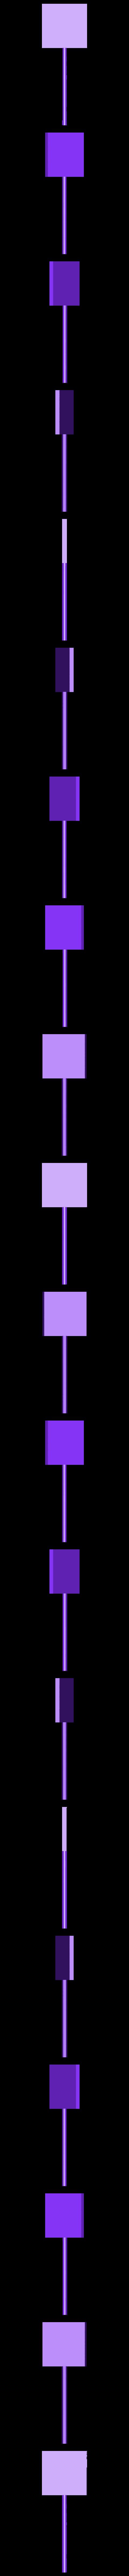 traffic-sign_square.stl Download free STL file Traffic Sign Models • 3D print model, Saran